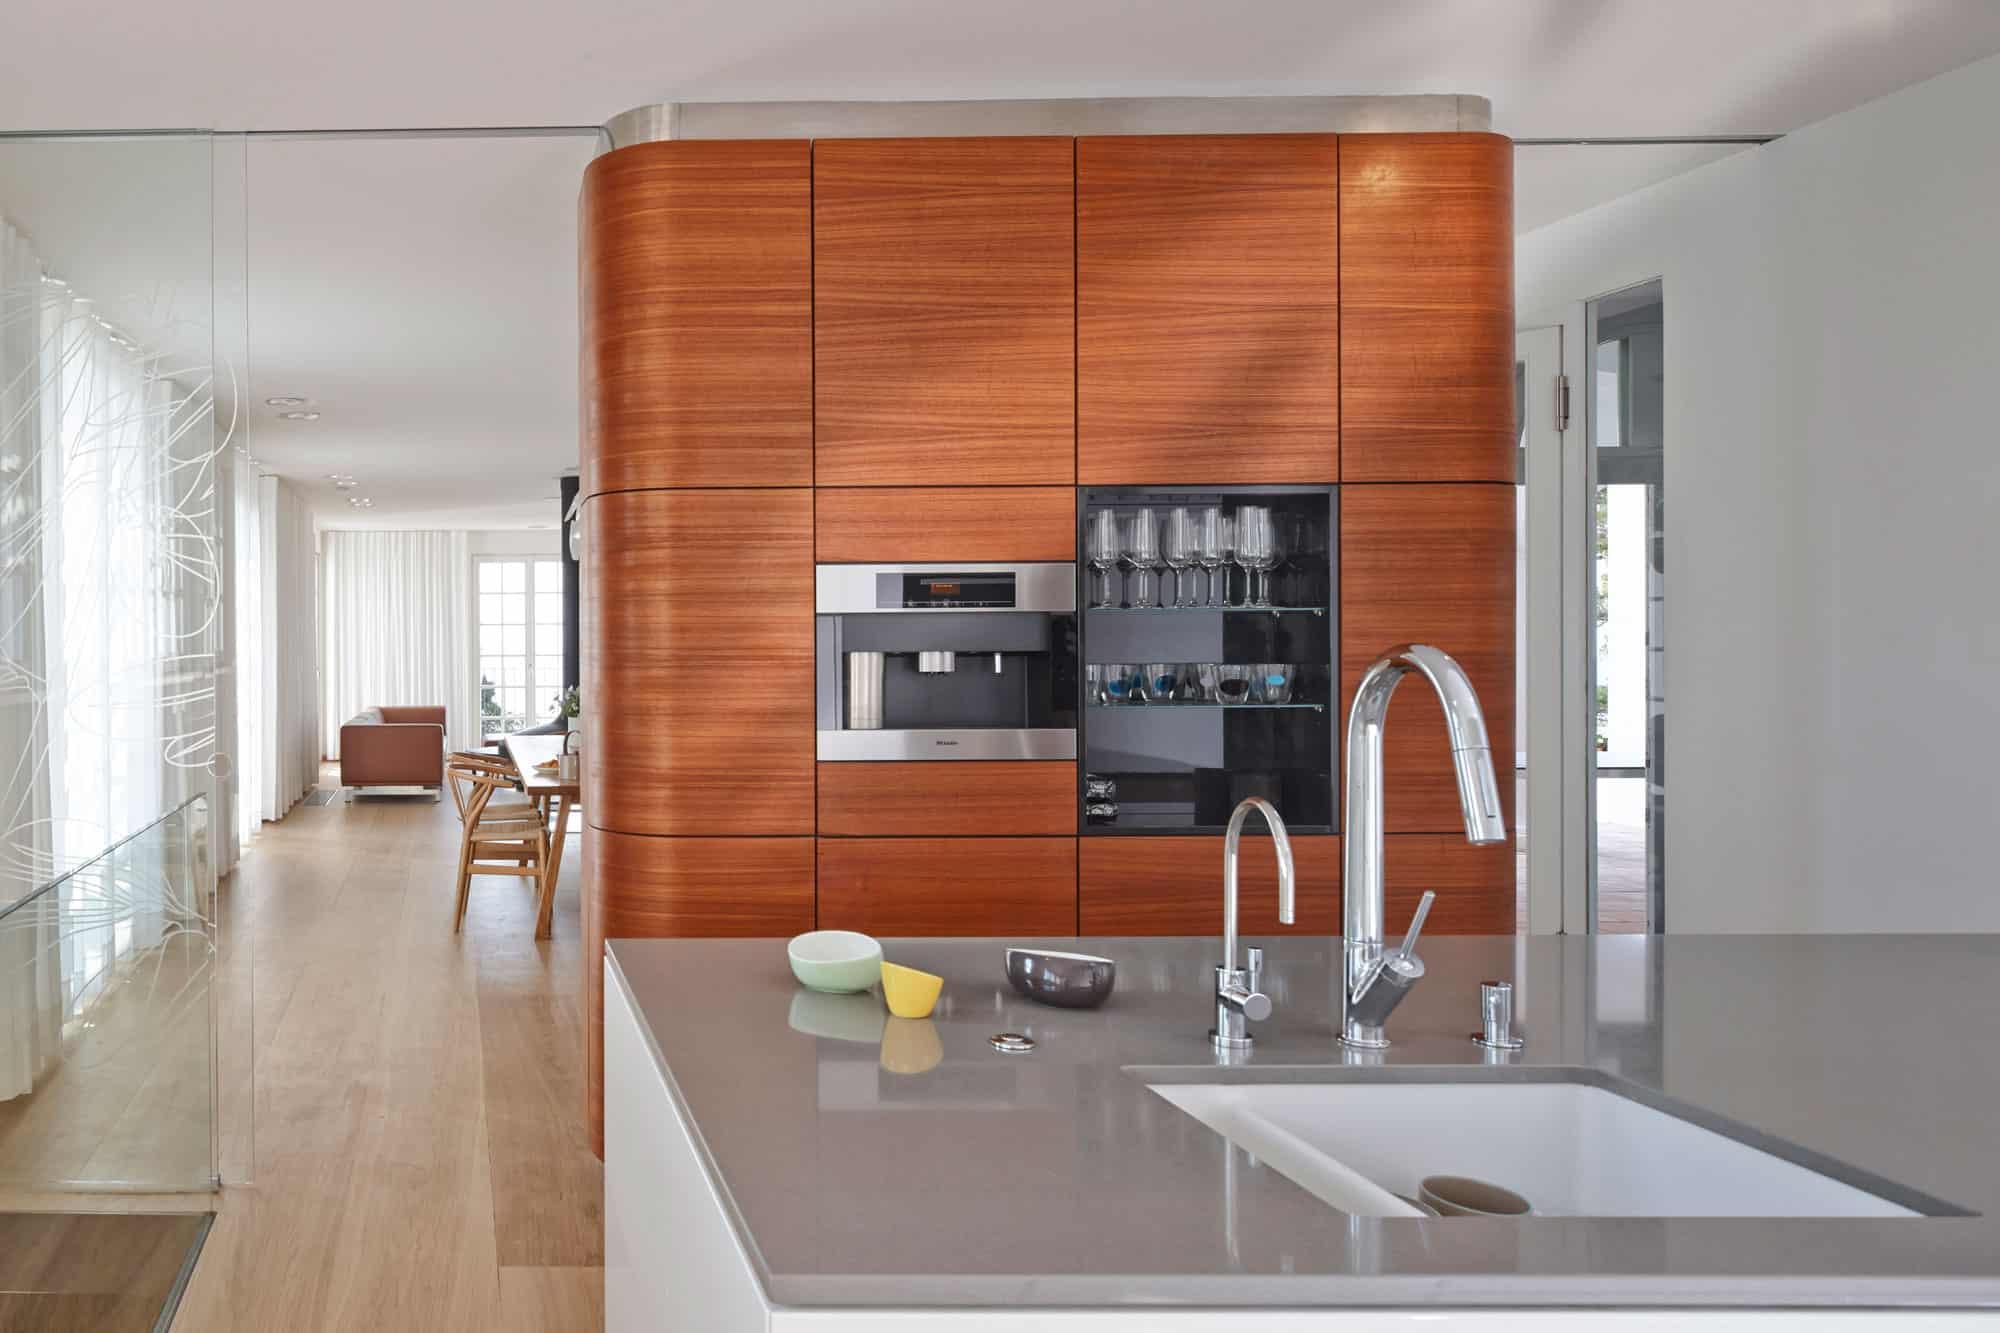 villa le trident by 4a architekten. Black Bedroom Furniture Sets. Home Design Ideas